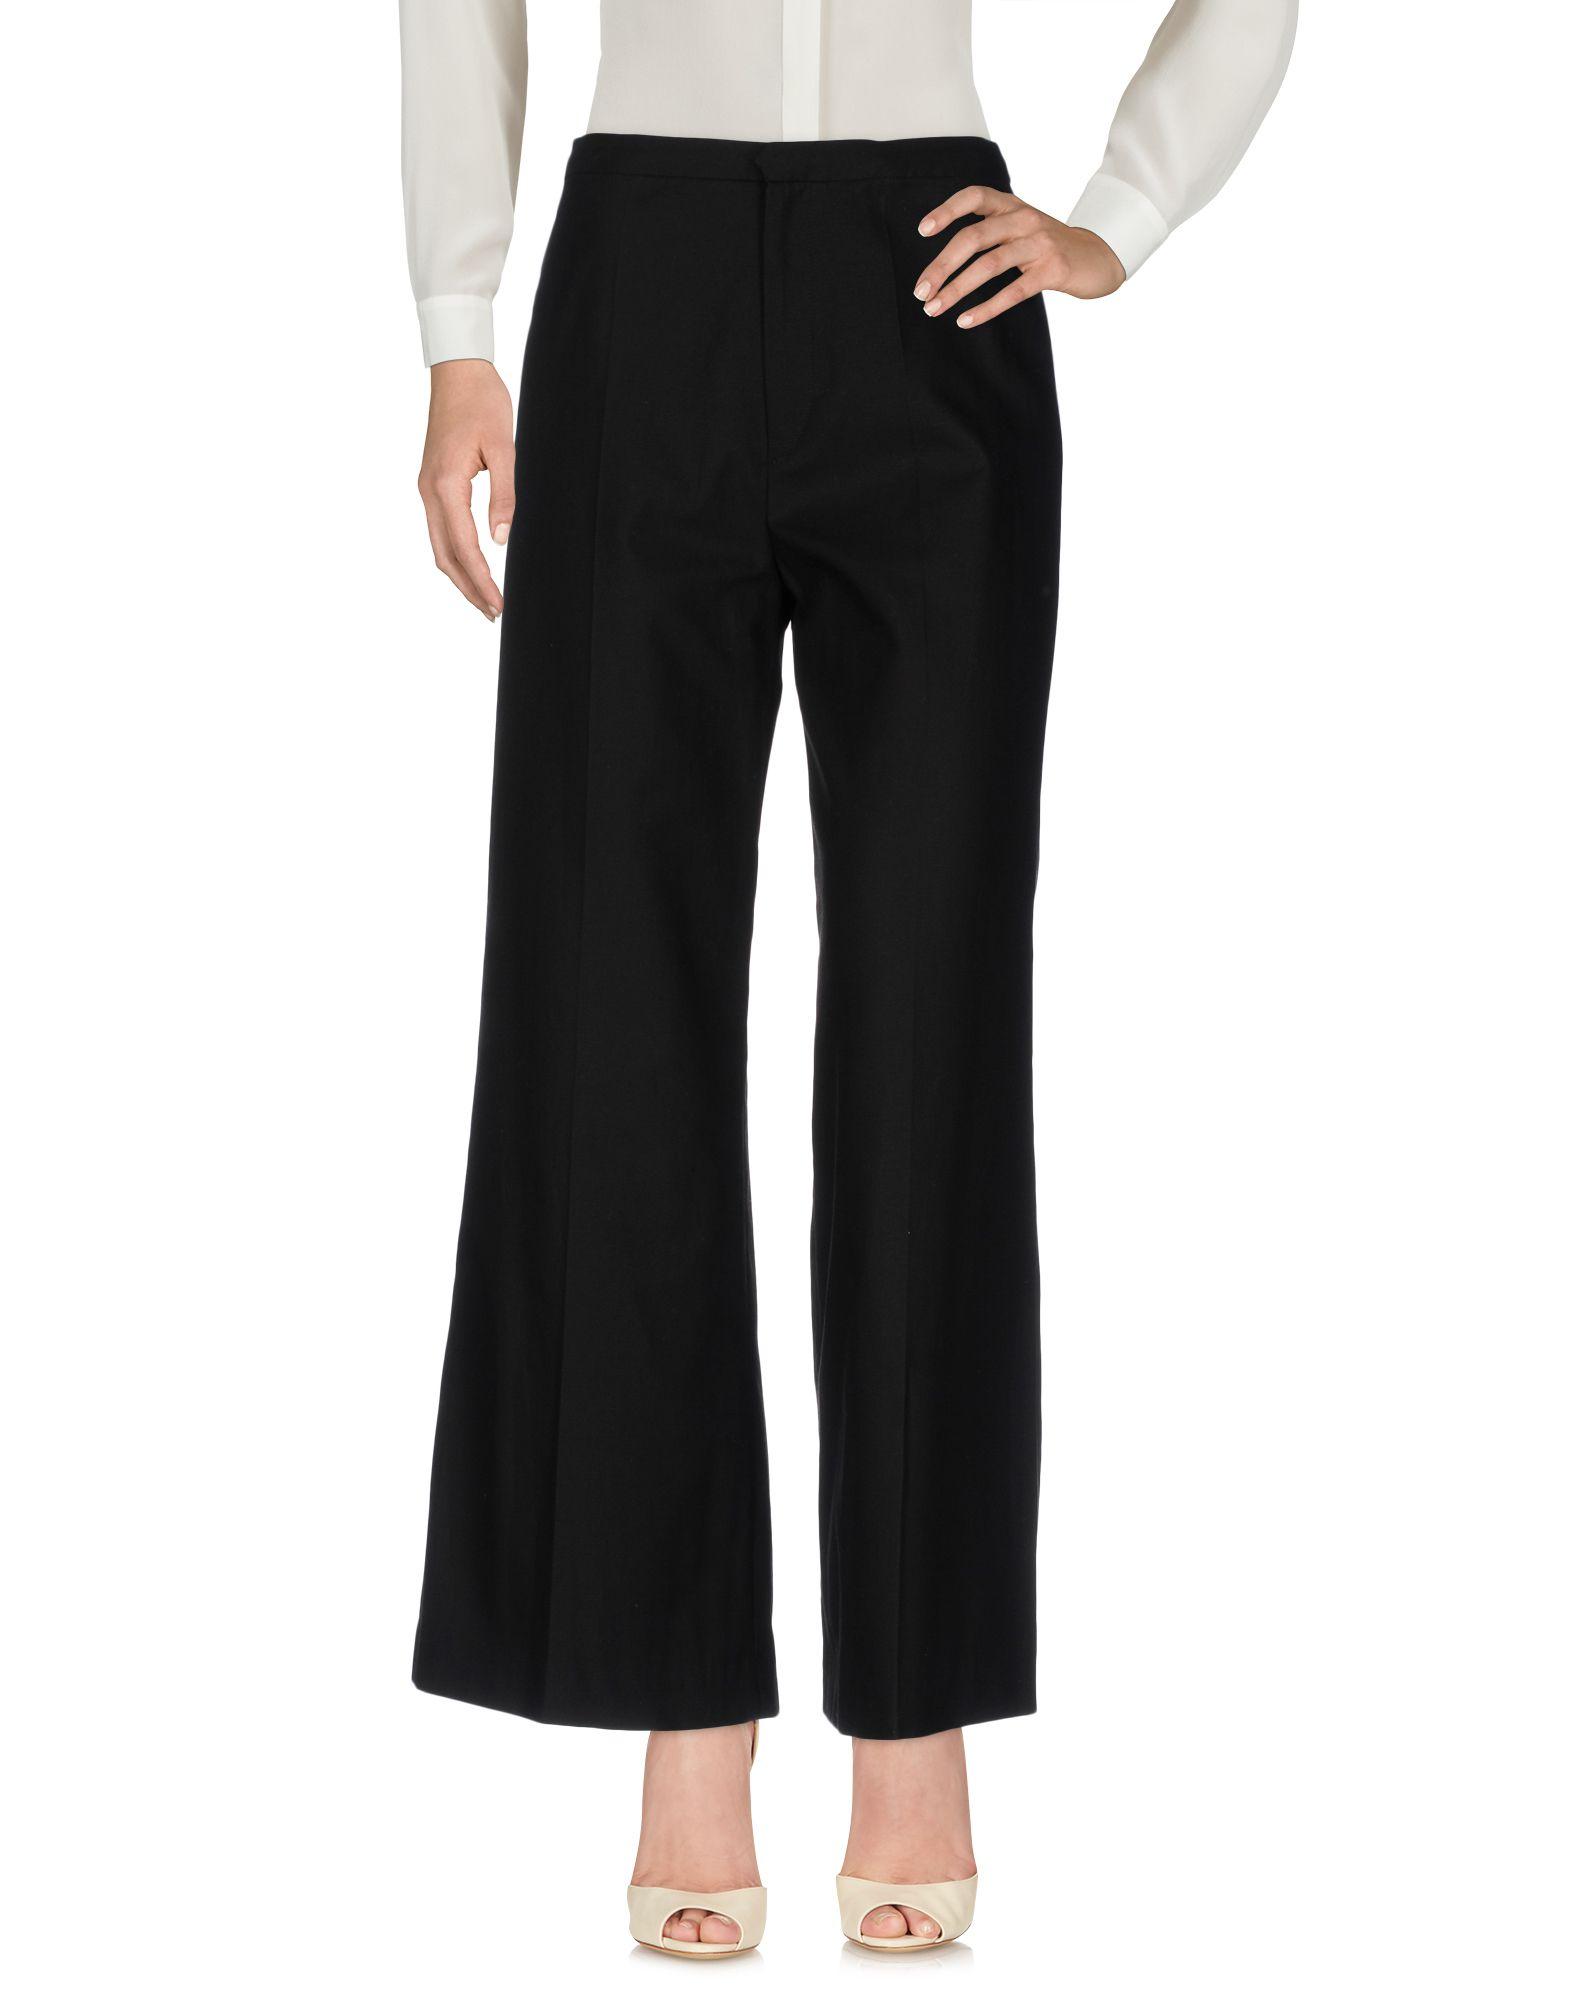 Pantalone Isabel Marant Donna - Acquista online su KtC6pJpL